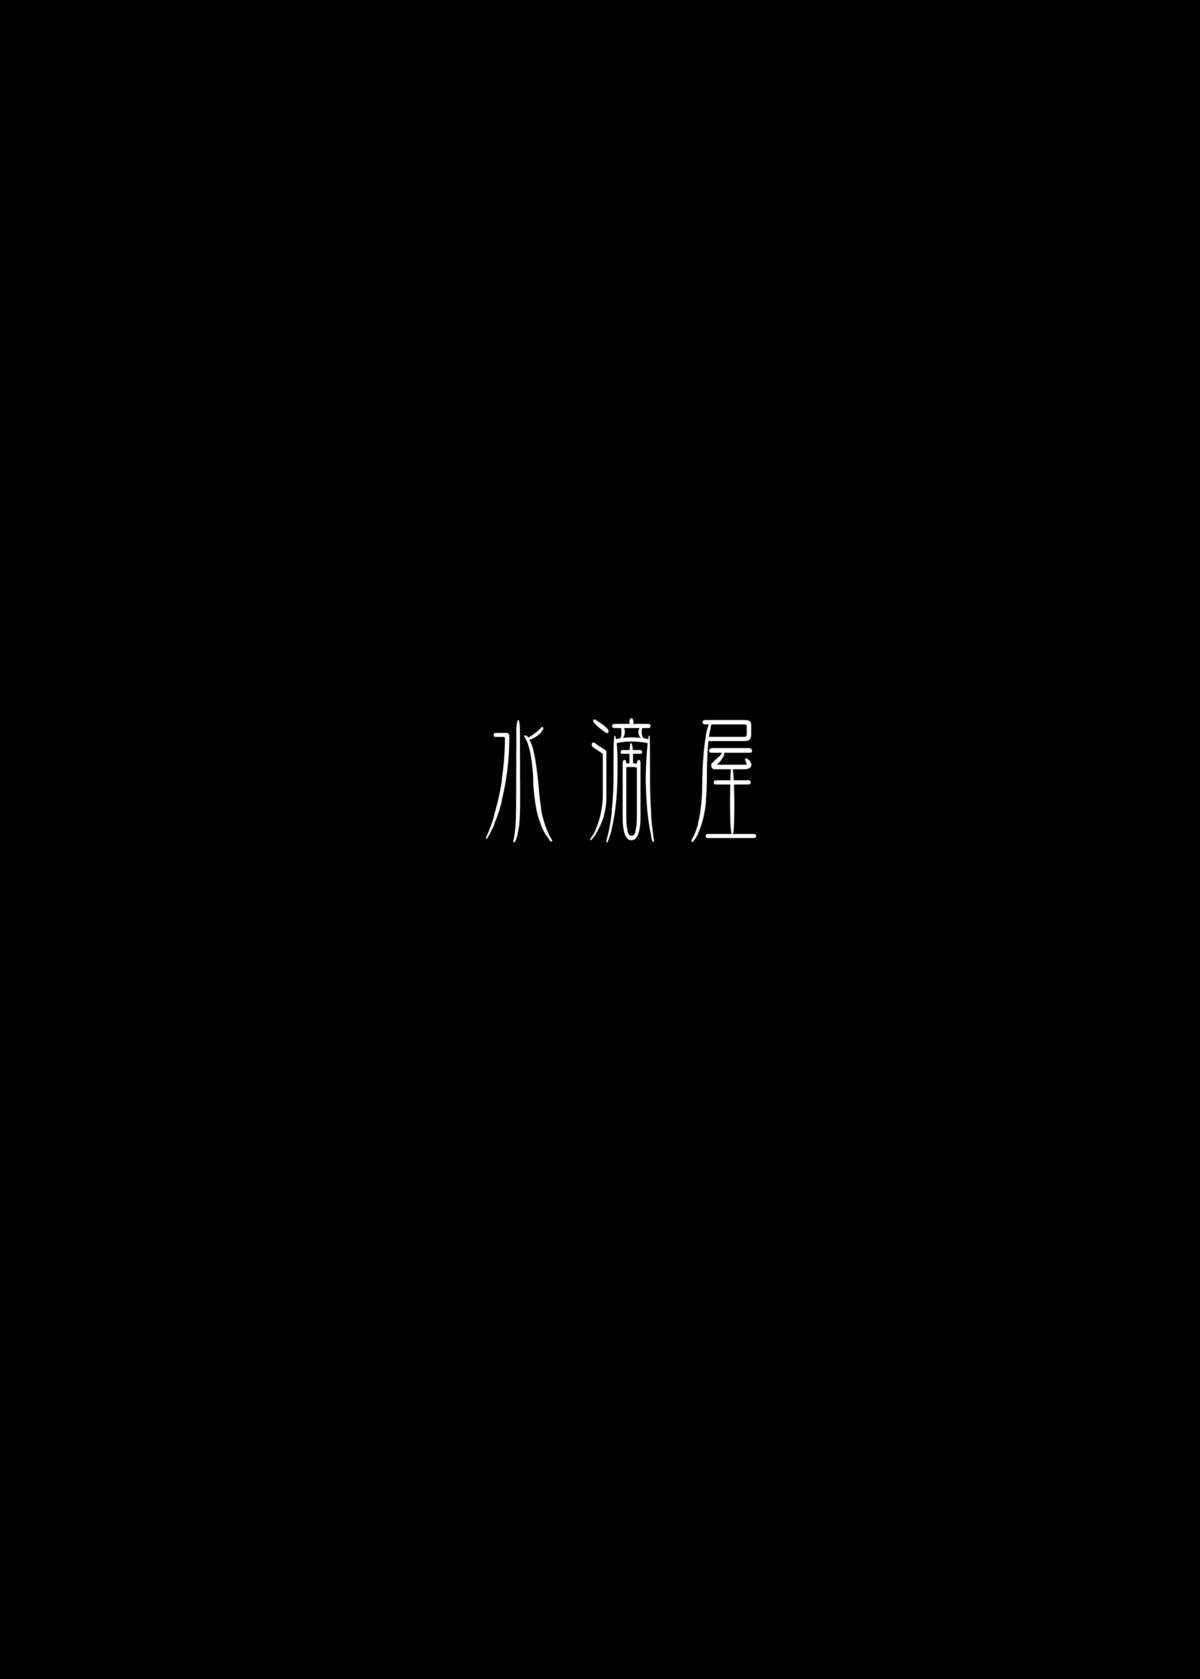 [Suitekiya (Suiteki-ka Yū-min)]Kennai Mating Scandal (1: Einclad / 2: Fairy Dance) SAO The Complete (Sword Art Online) 15